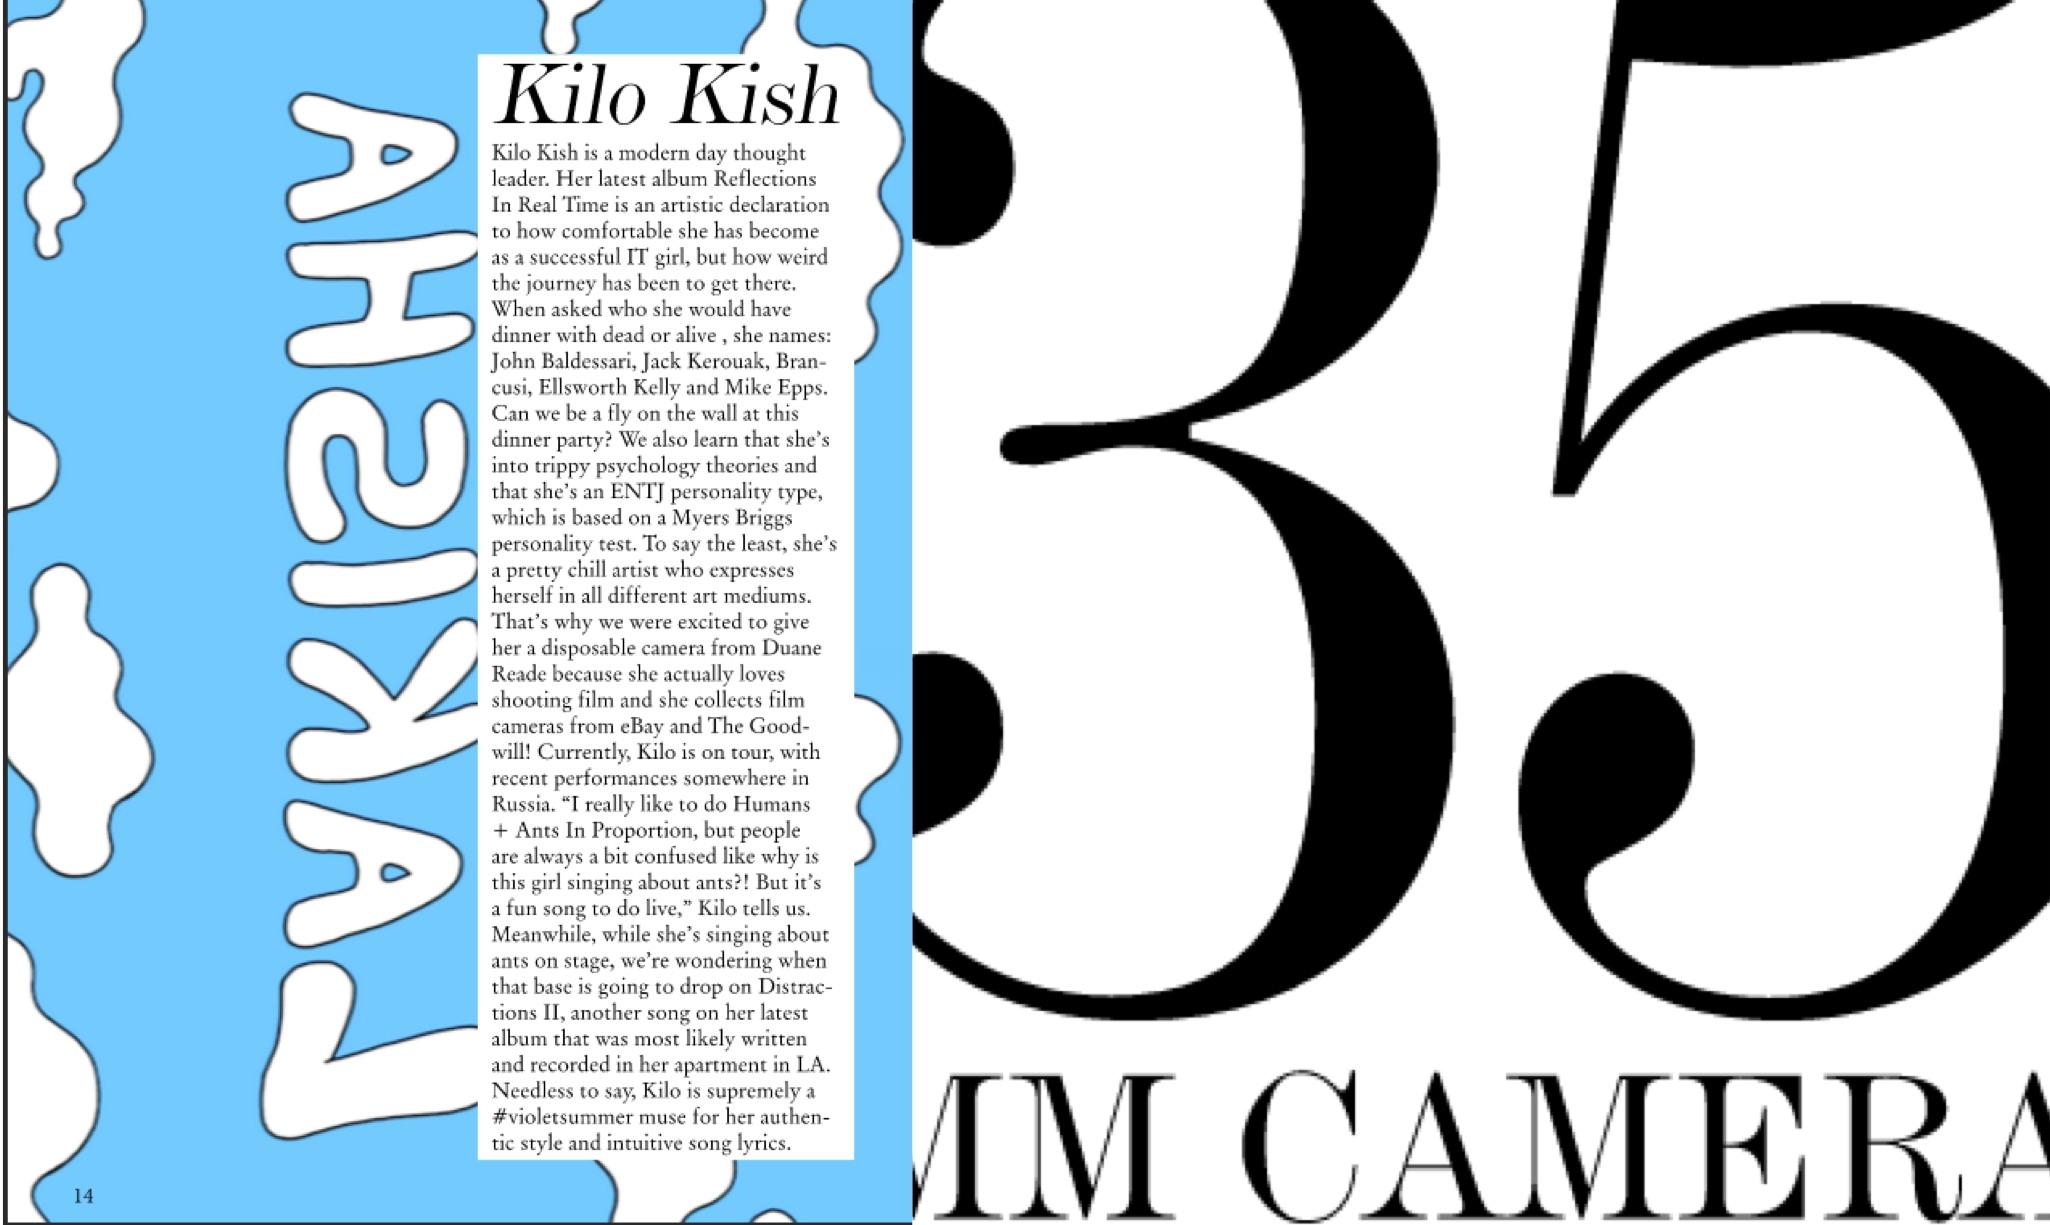 Kilo_Kish.jpg